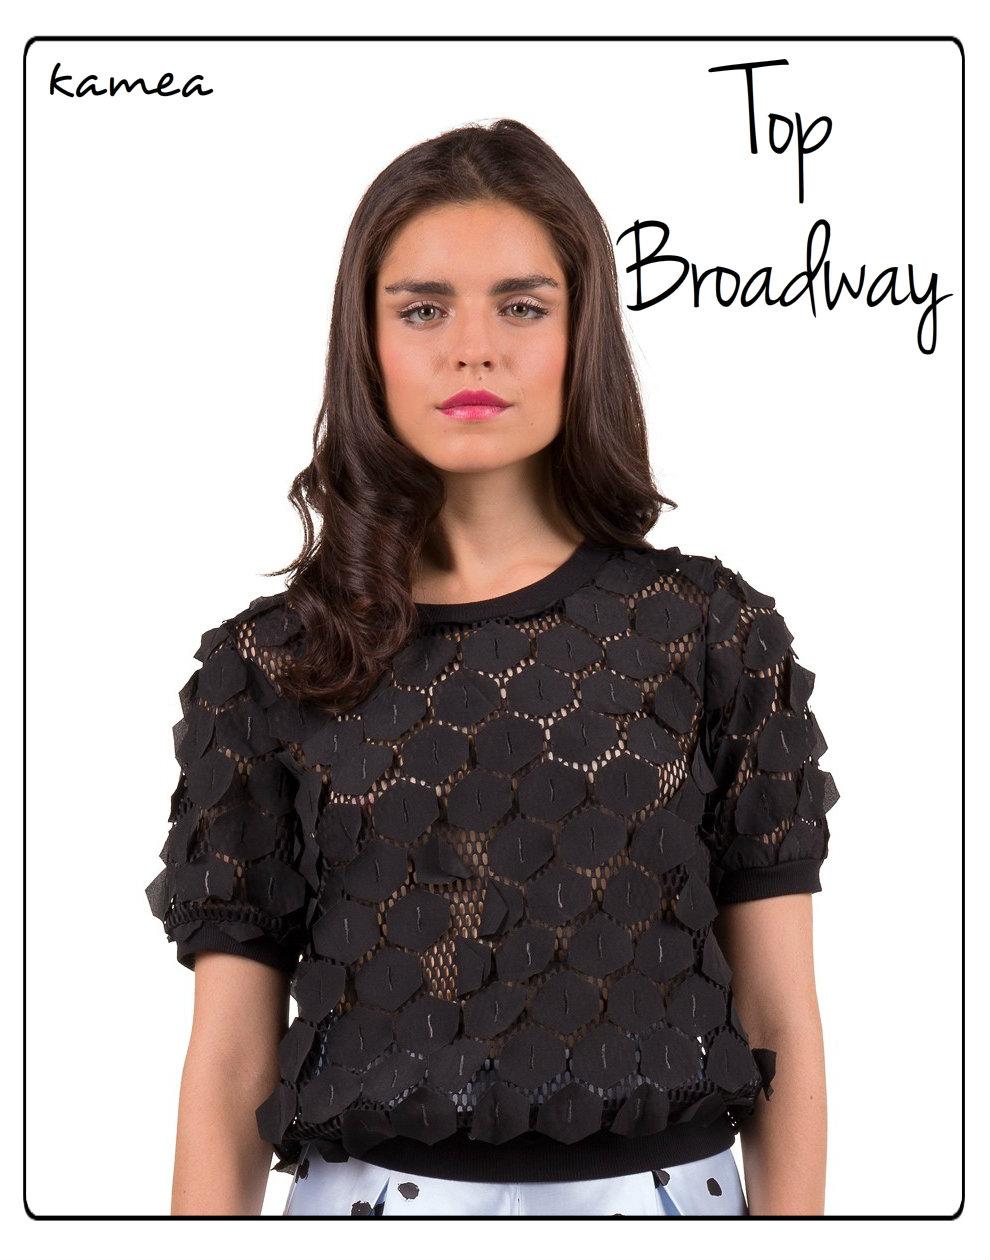 top broadway